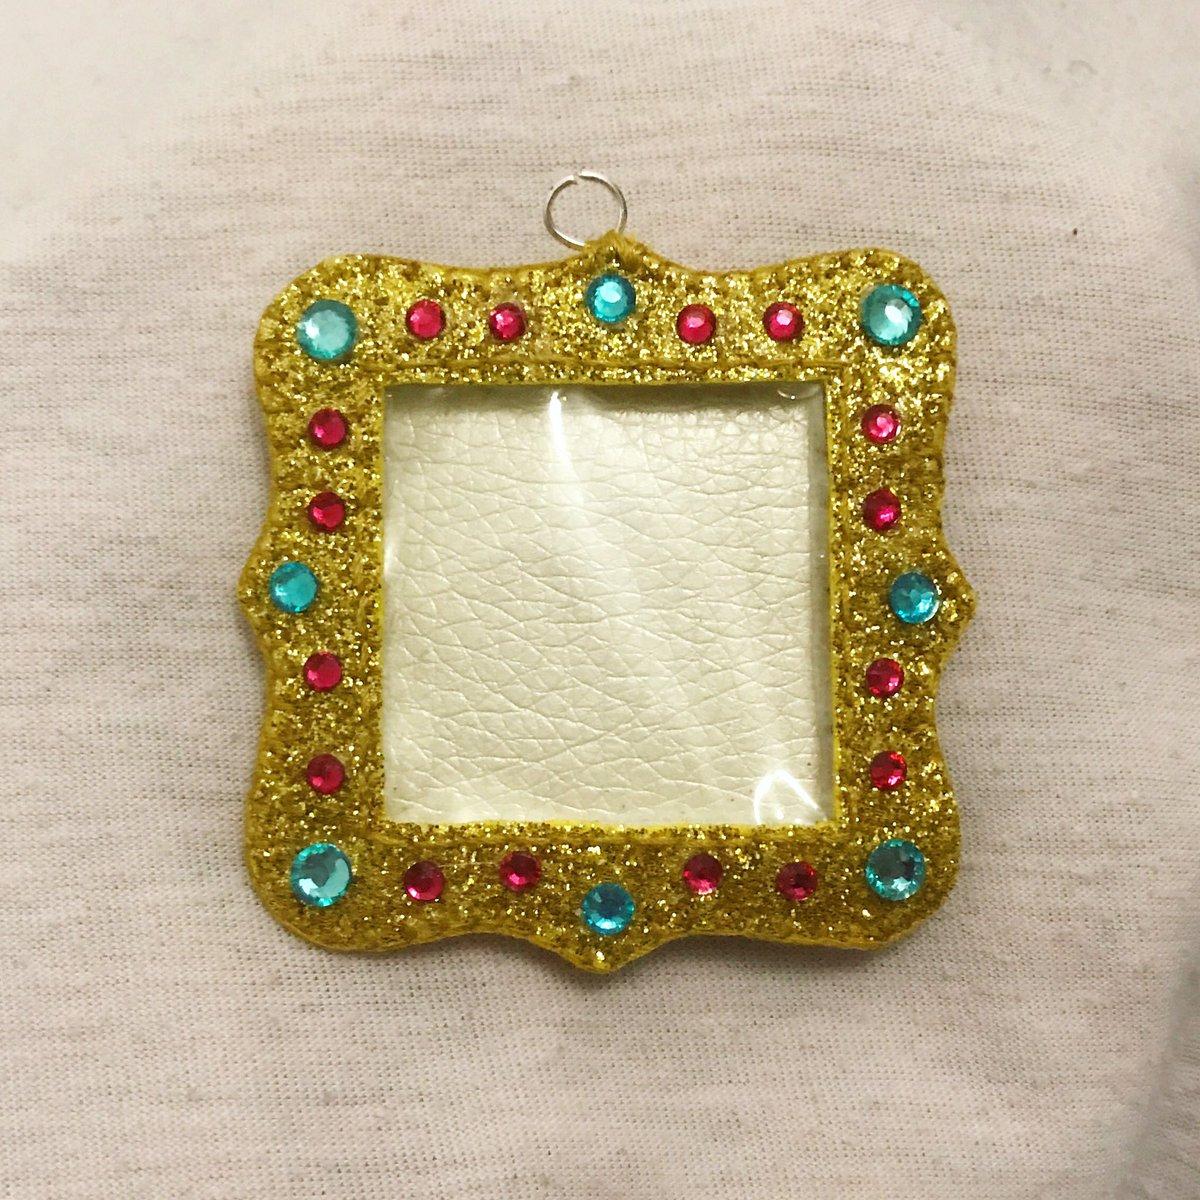 Mini fancy frame #art #photo #frame #cute #glitter #felt #leatherette #mini #gem #gold #keyring #small #artoftheday #photooftheday #artist #maker  - Ukustom